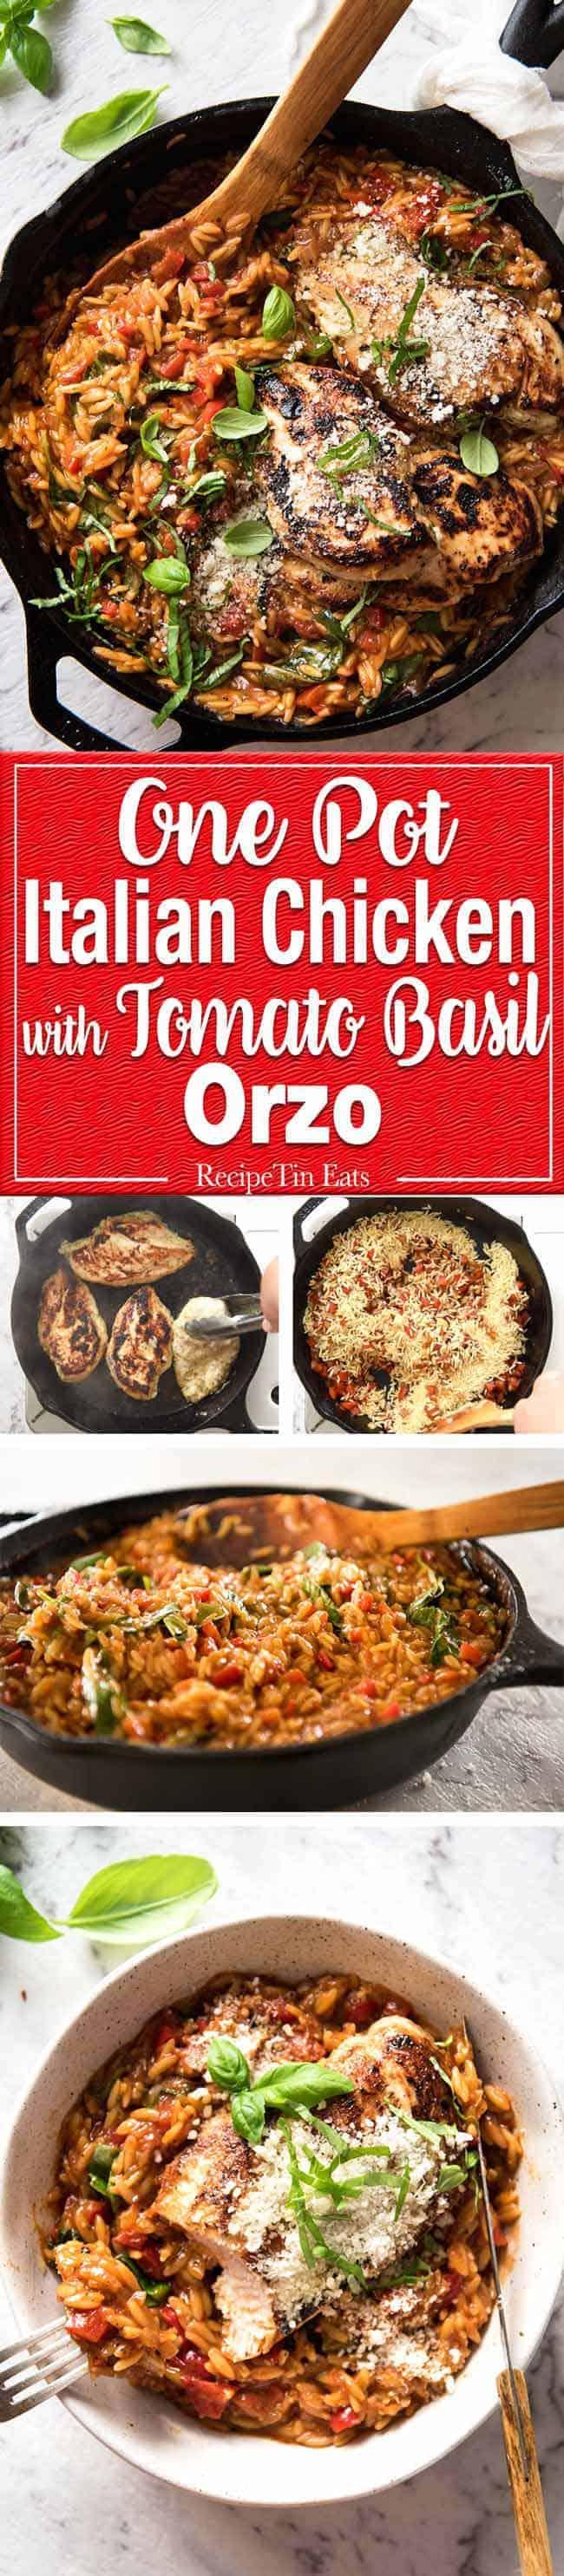 Risoni Pasta Recipe with Chicken - Italian Chicken with a tomato basil risoni pasta recipe, all made in one pot! Quick, super tasty 30 minute meal. www.recipetineats.com